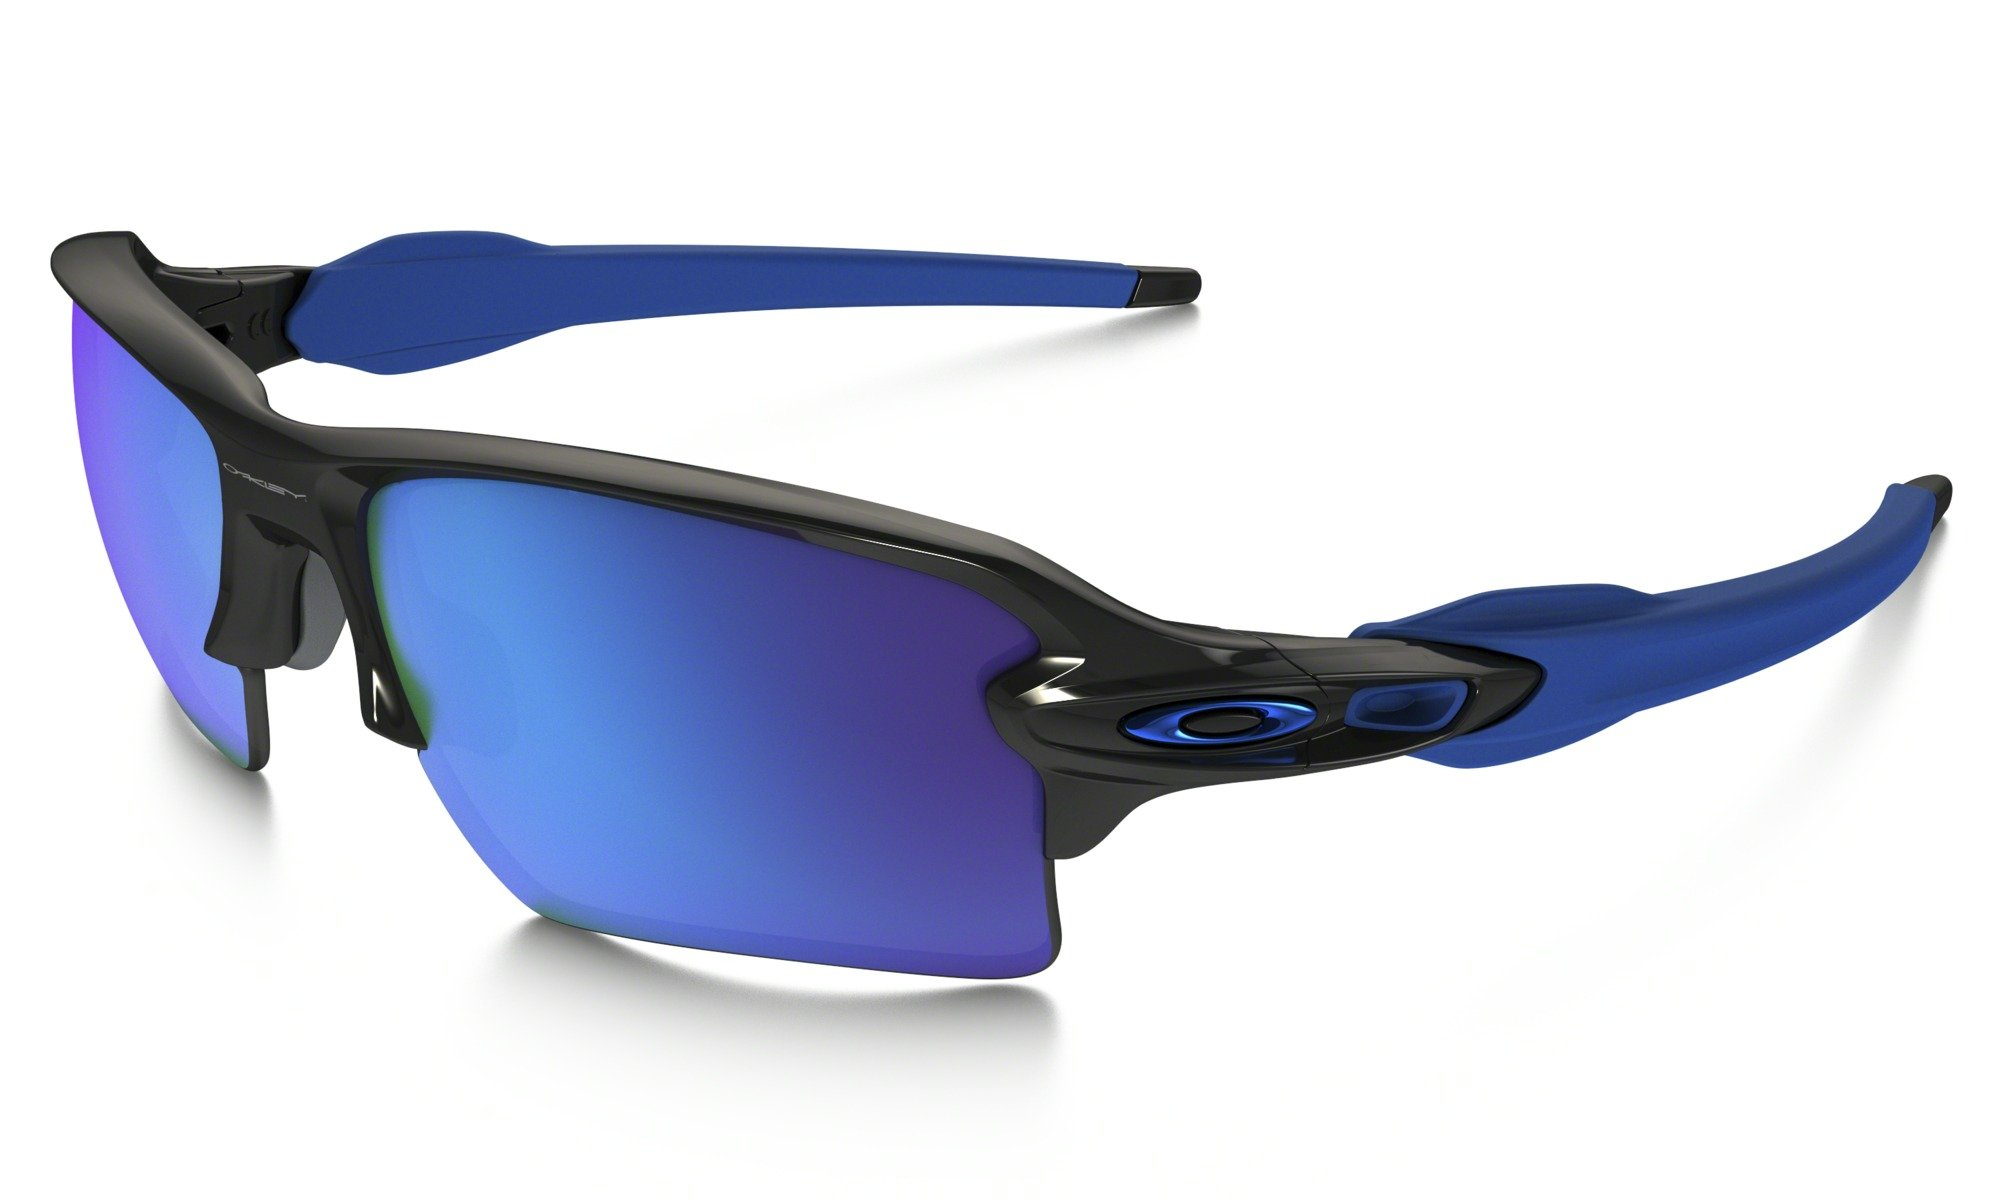 Sluneční brýle Oakley OAKLEY Flak 2.0 XL Polished Black w/Sapphire Iridium